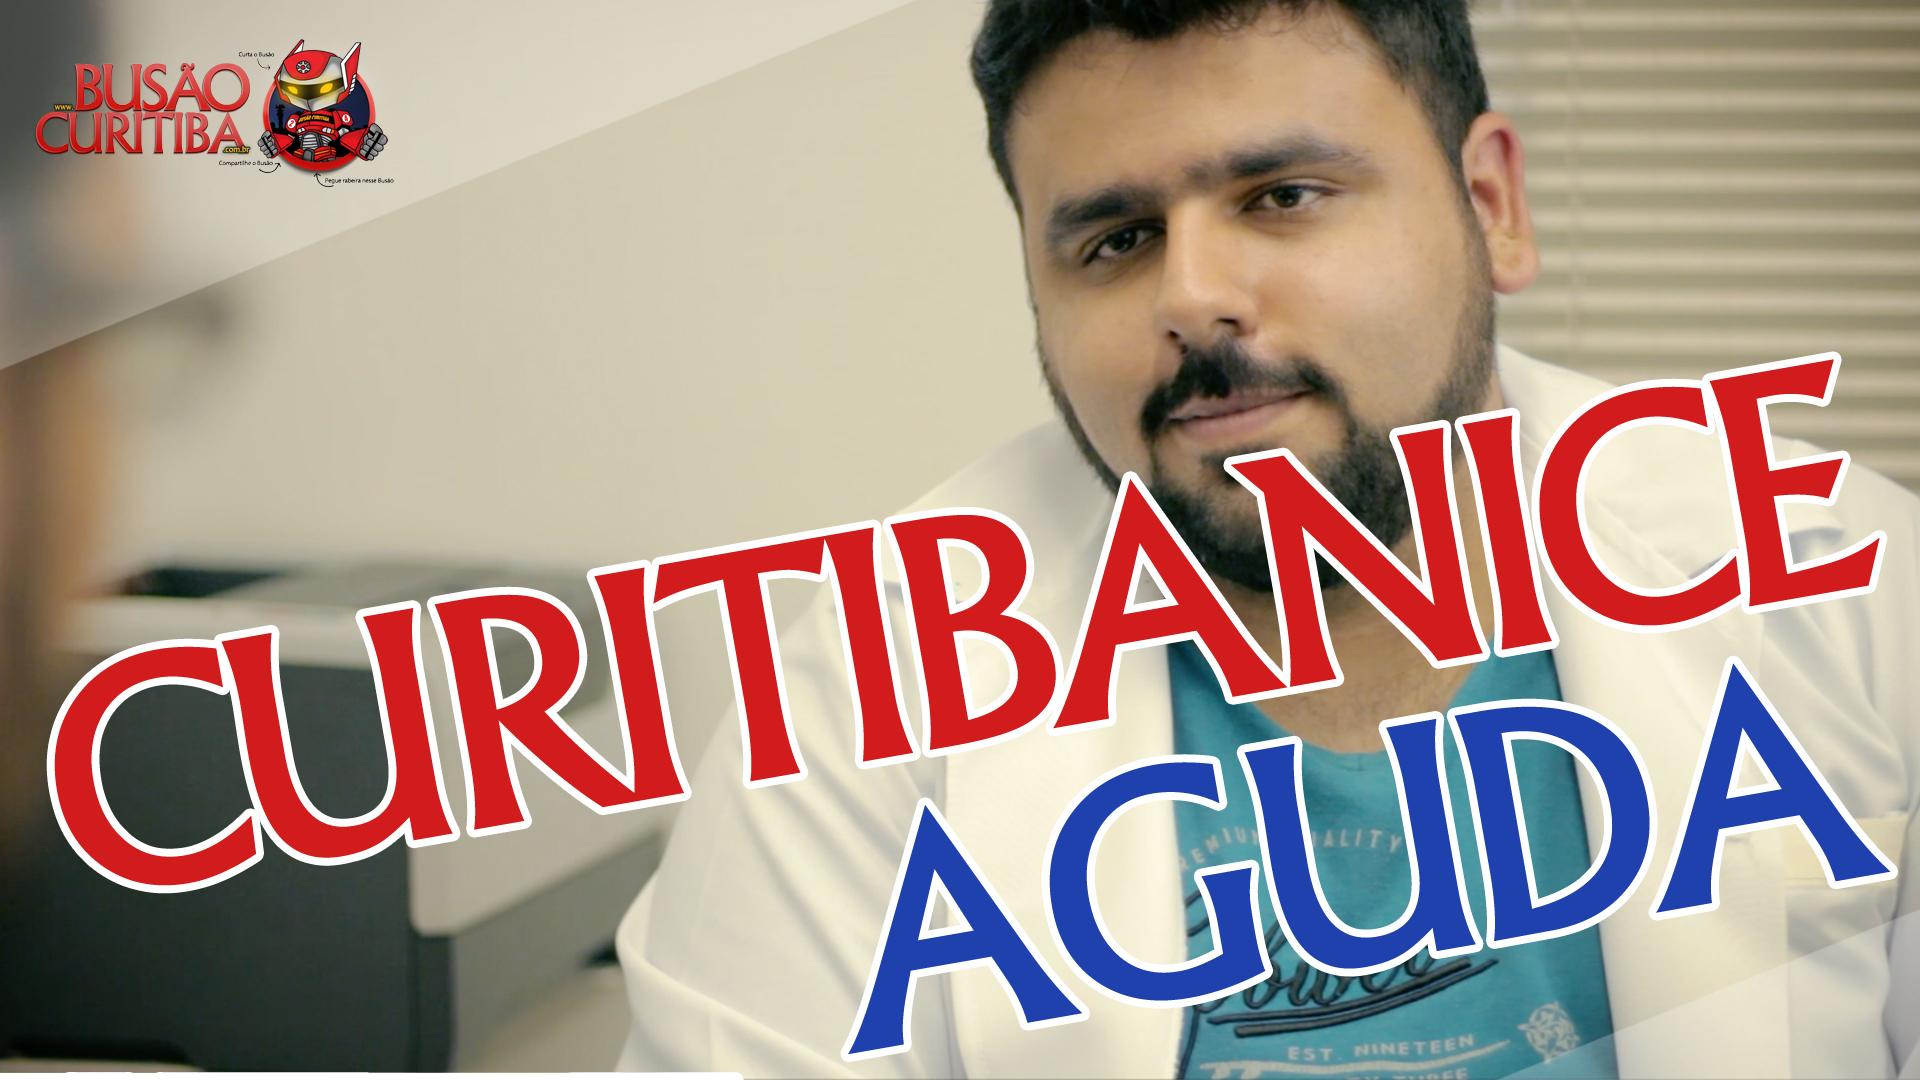 Curitibanice Aguda